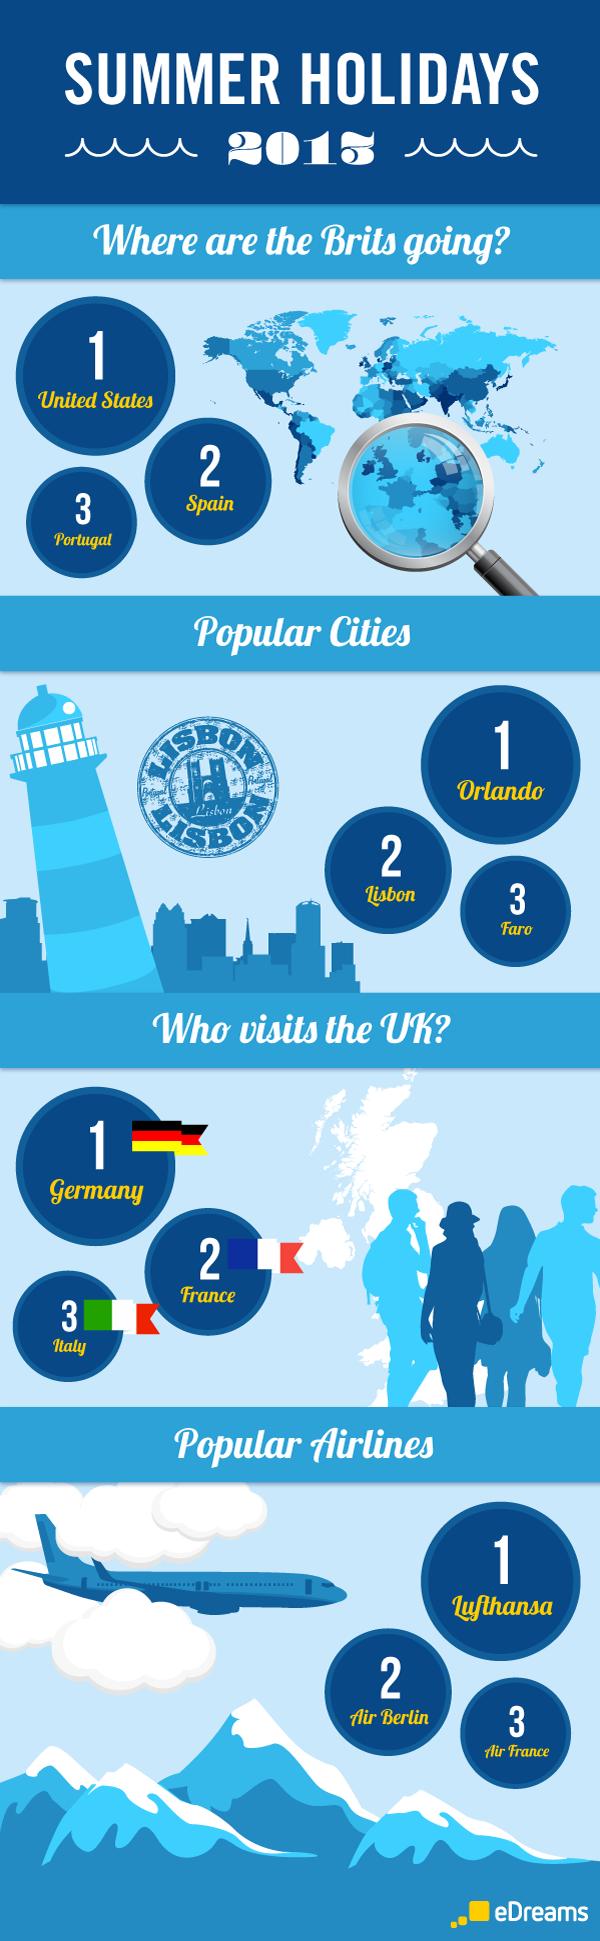 british summer holidays 2013 destinations